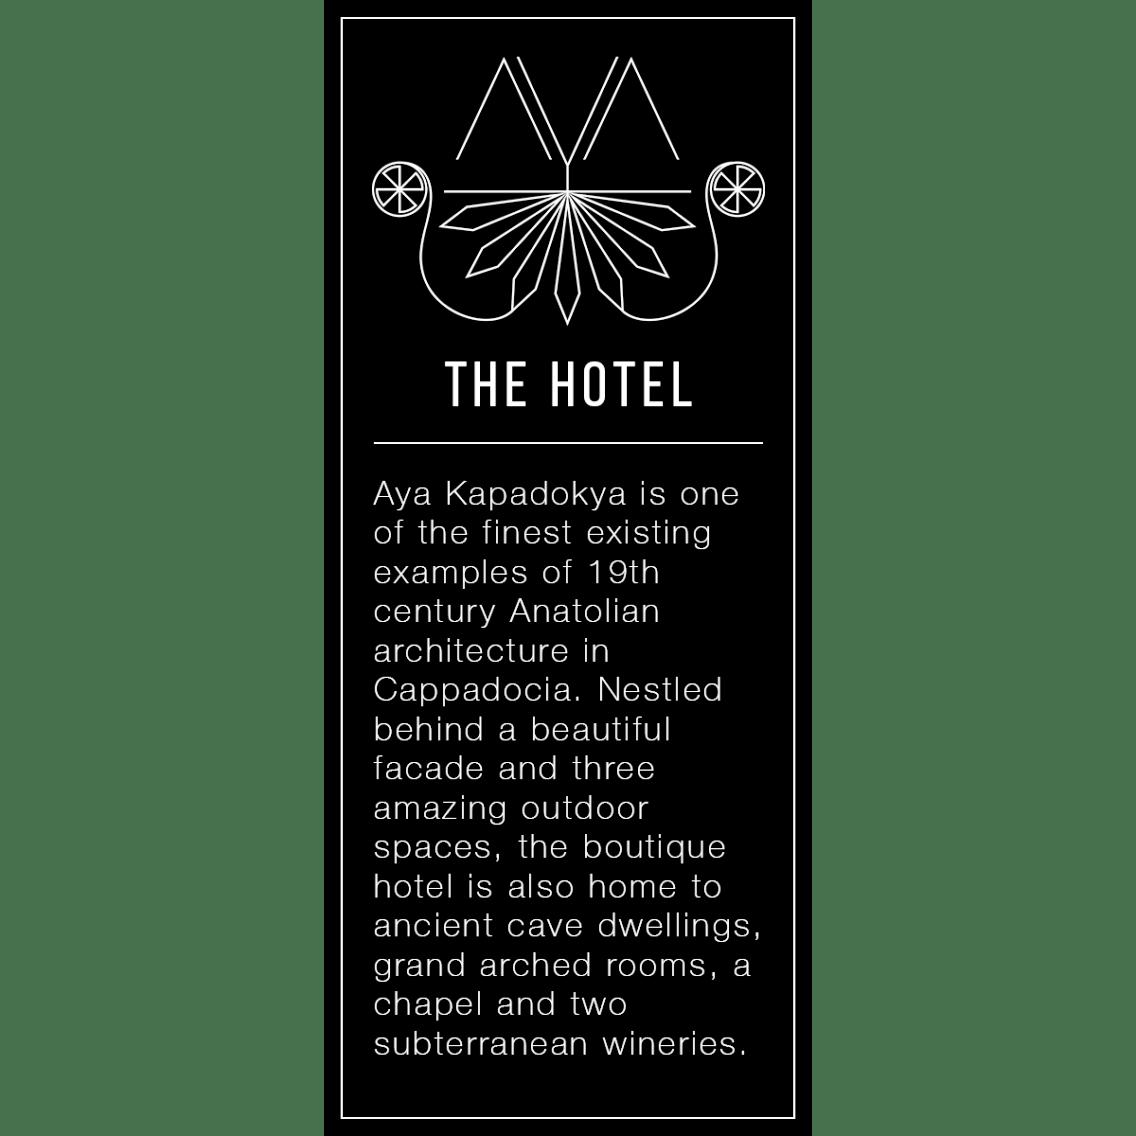 aya-kapadokya-home-page-text-hotel